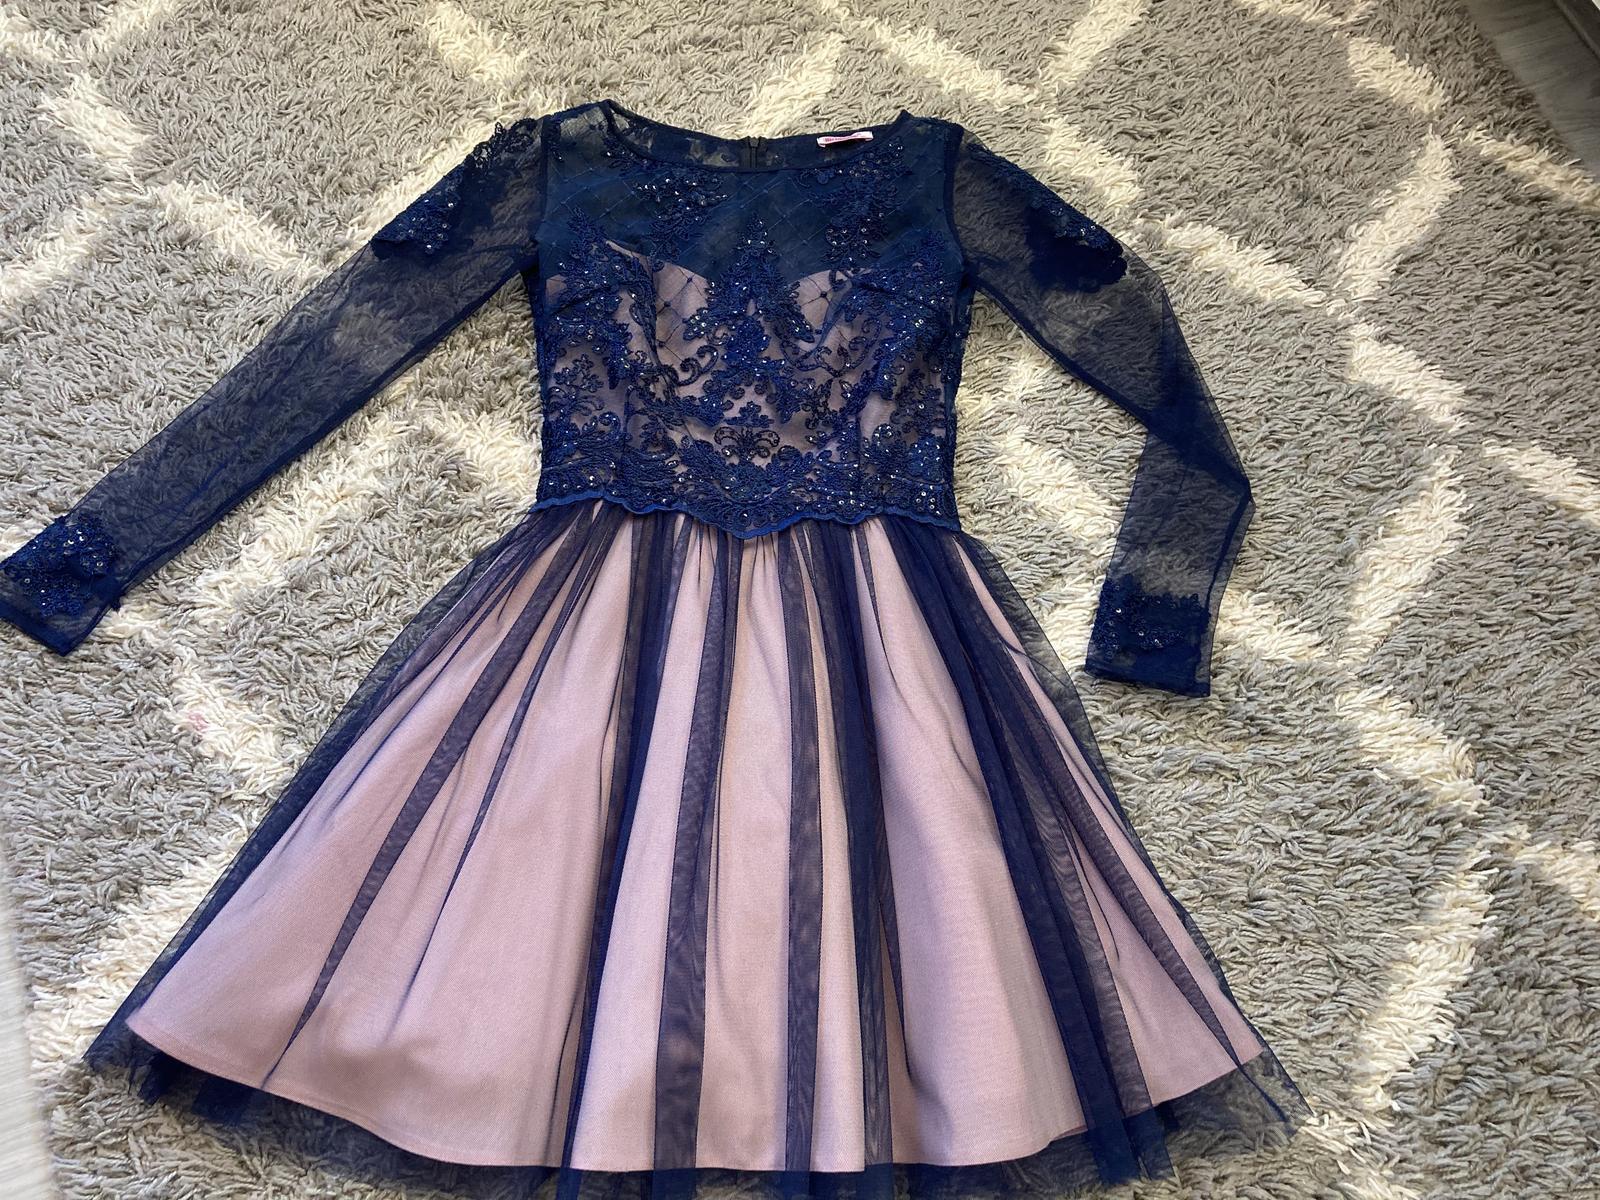 Elegantne šaty 36 - Obrázok č. 2